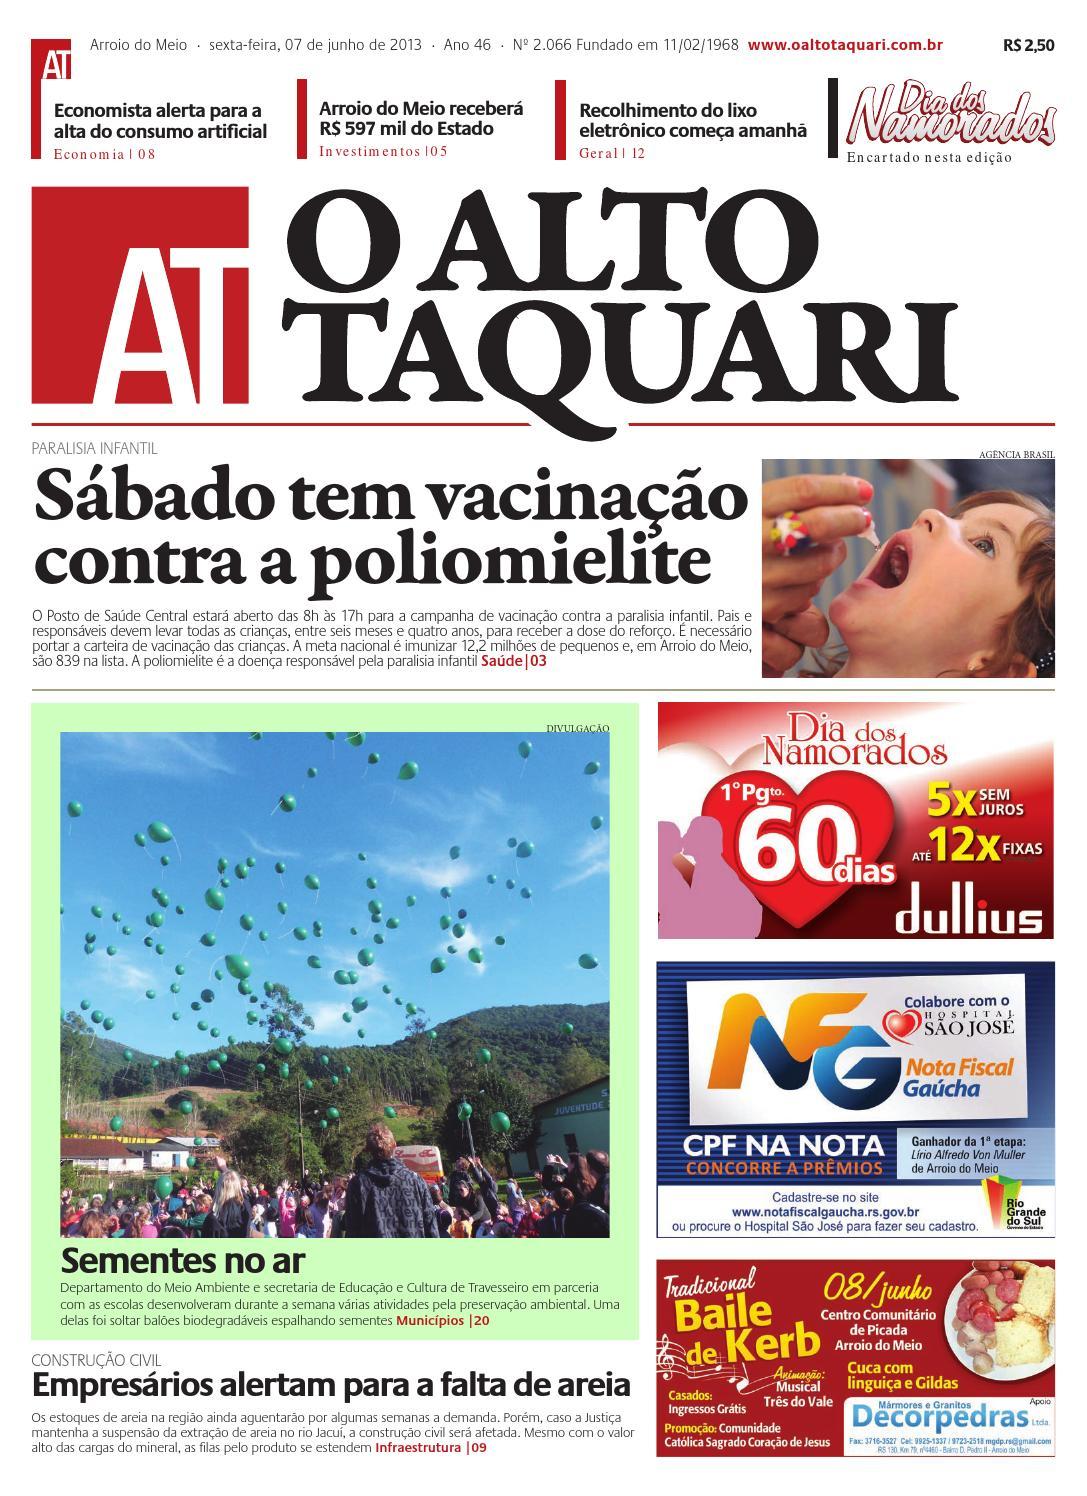 4534a1c15 Jornal O Alto Taquari - 07 de junho de 2013 by Jornal O Alto Taquari - issuu